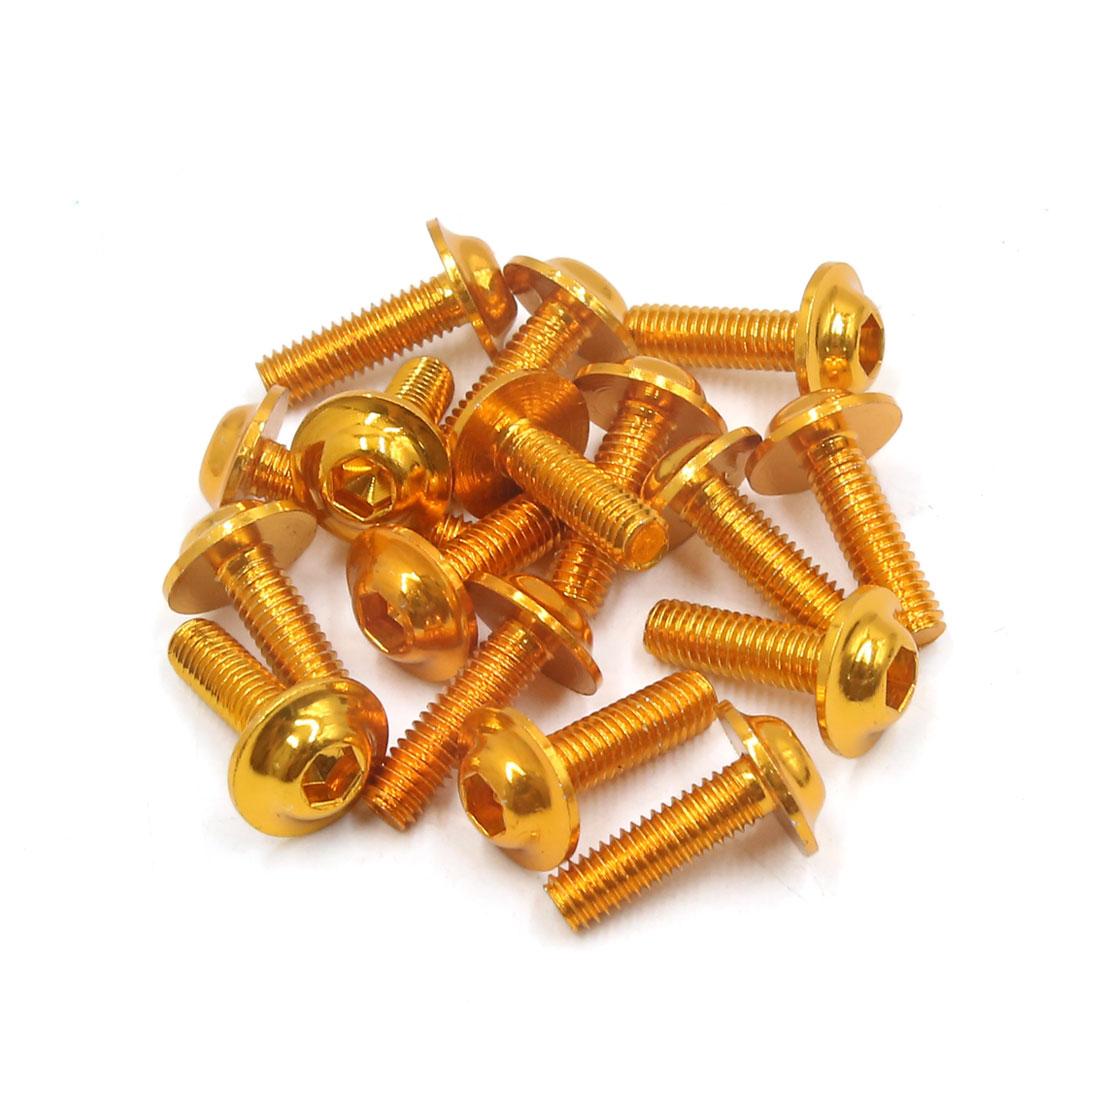 16Pcs Gold Tone Metal 6mm Thread Dia Motorcycle Hexagon Bolts Screws